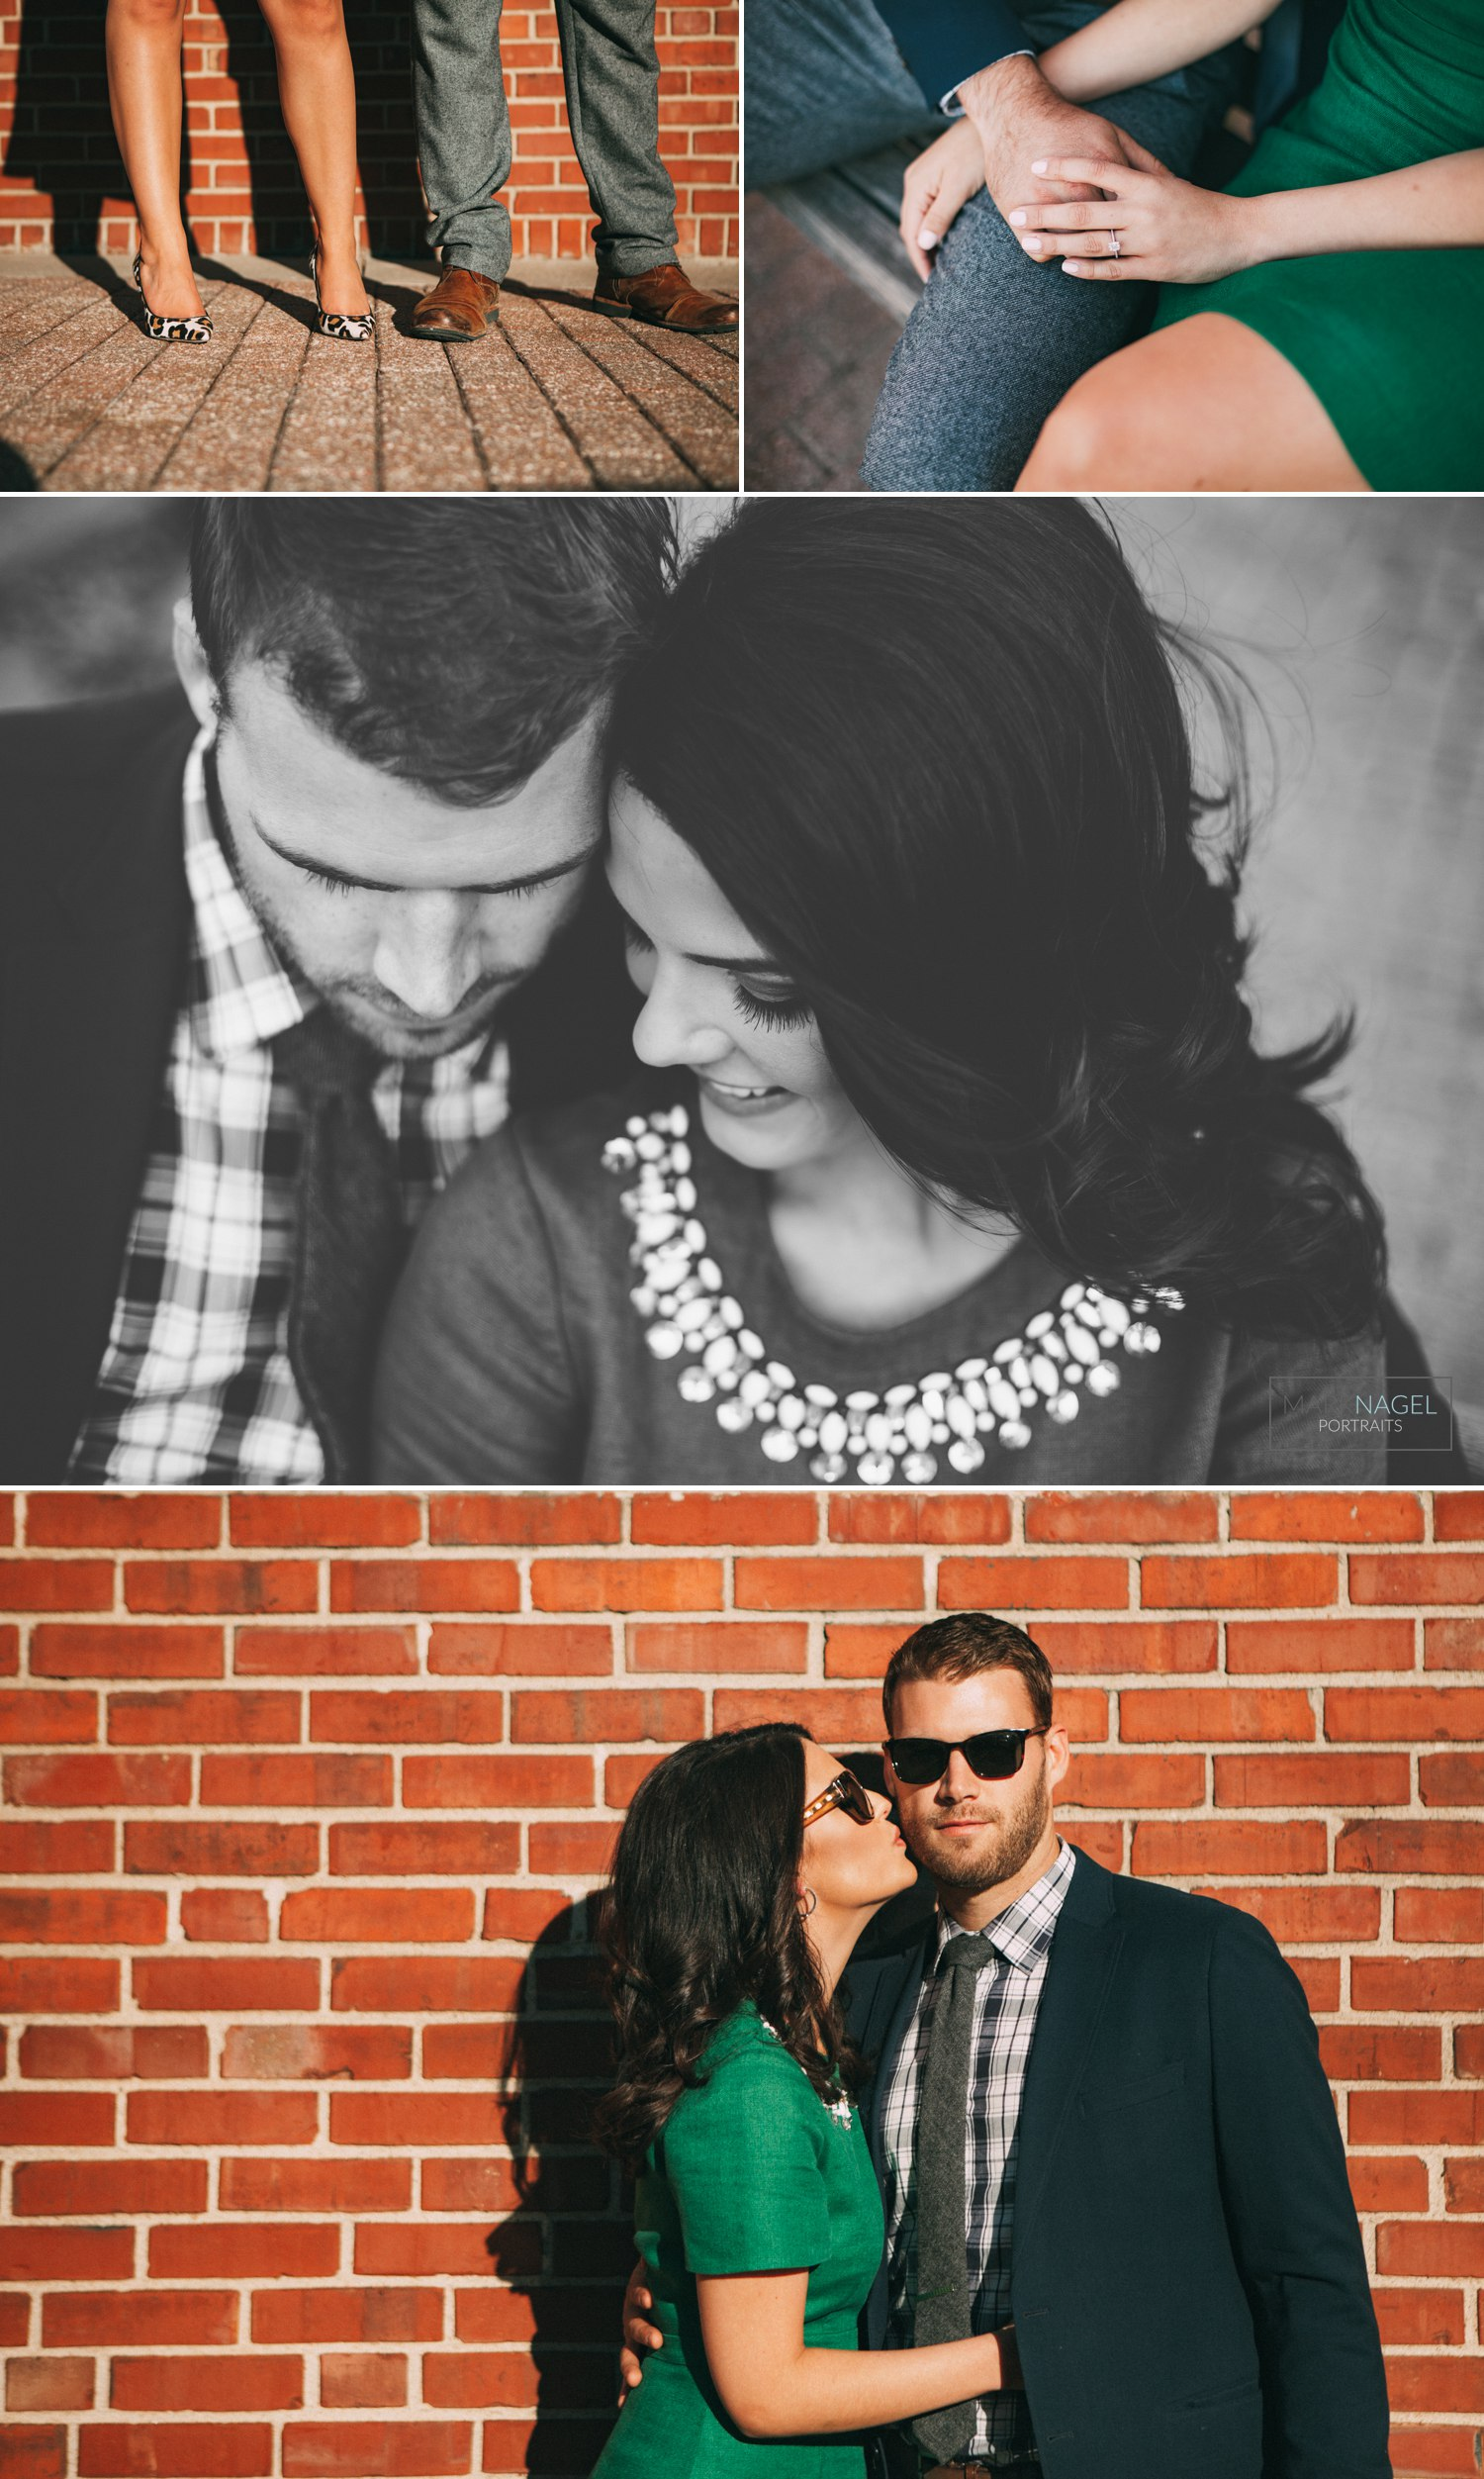 engagement photo session downtown kansas city urban